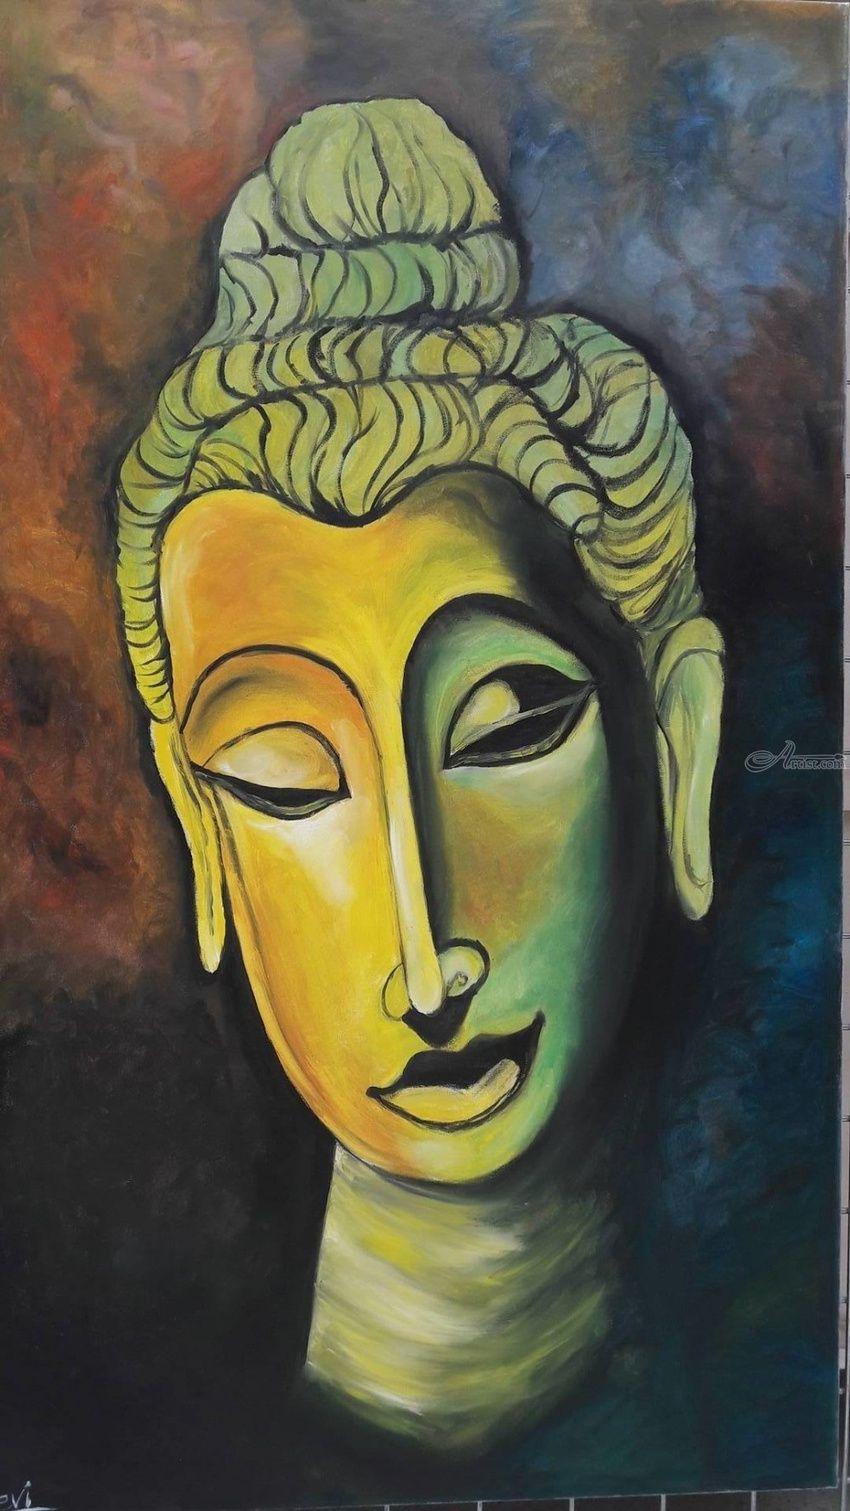 Lord buddha Paintings by Tecla Alahakoon - Artist.com